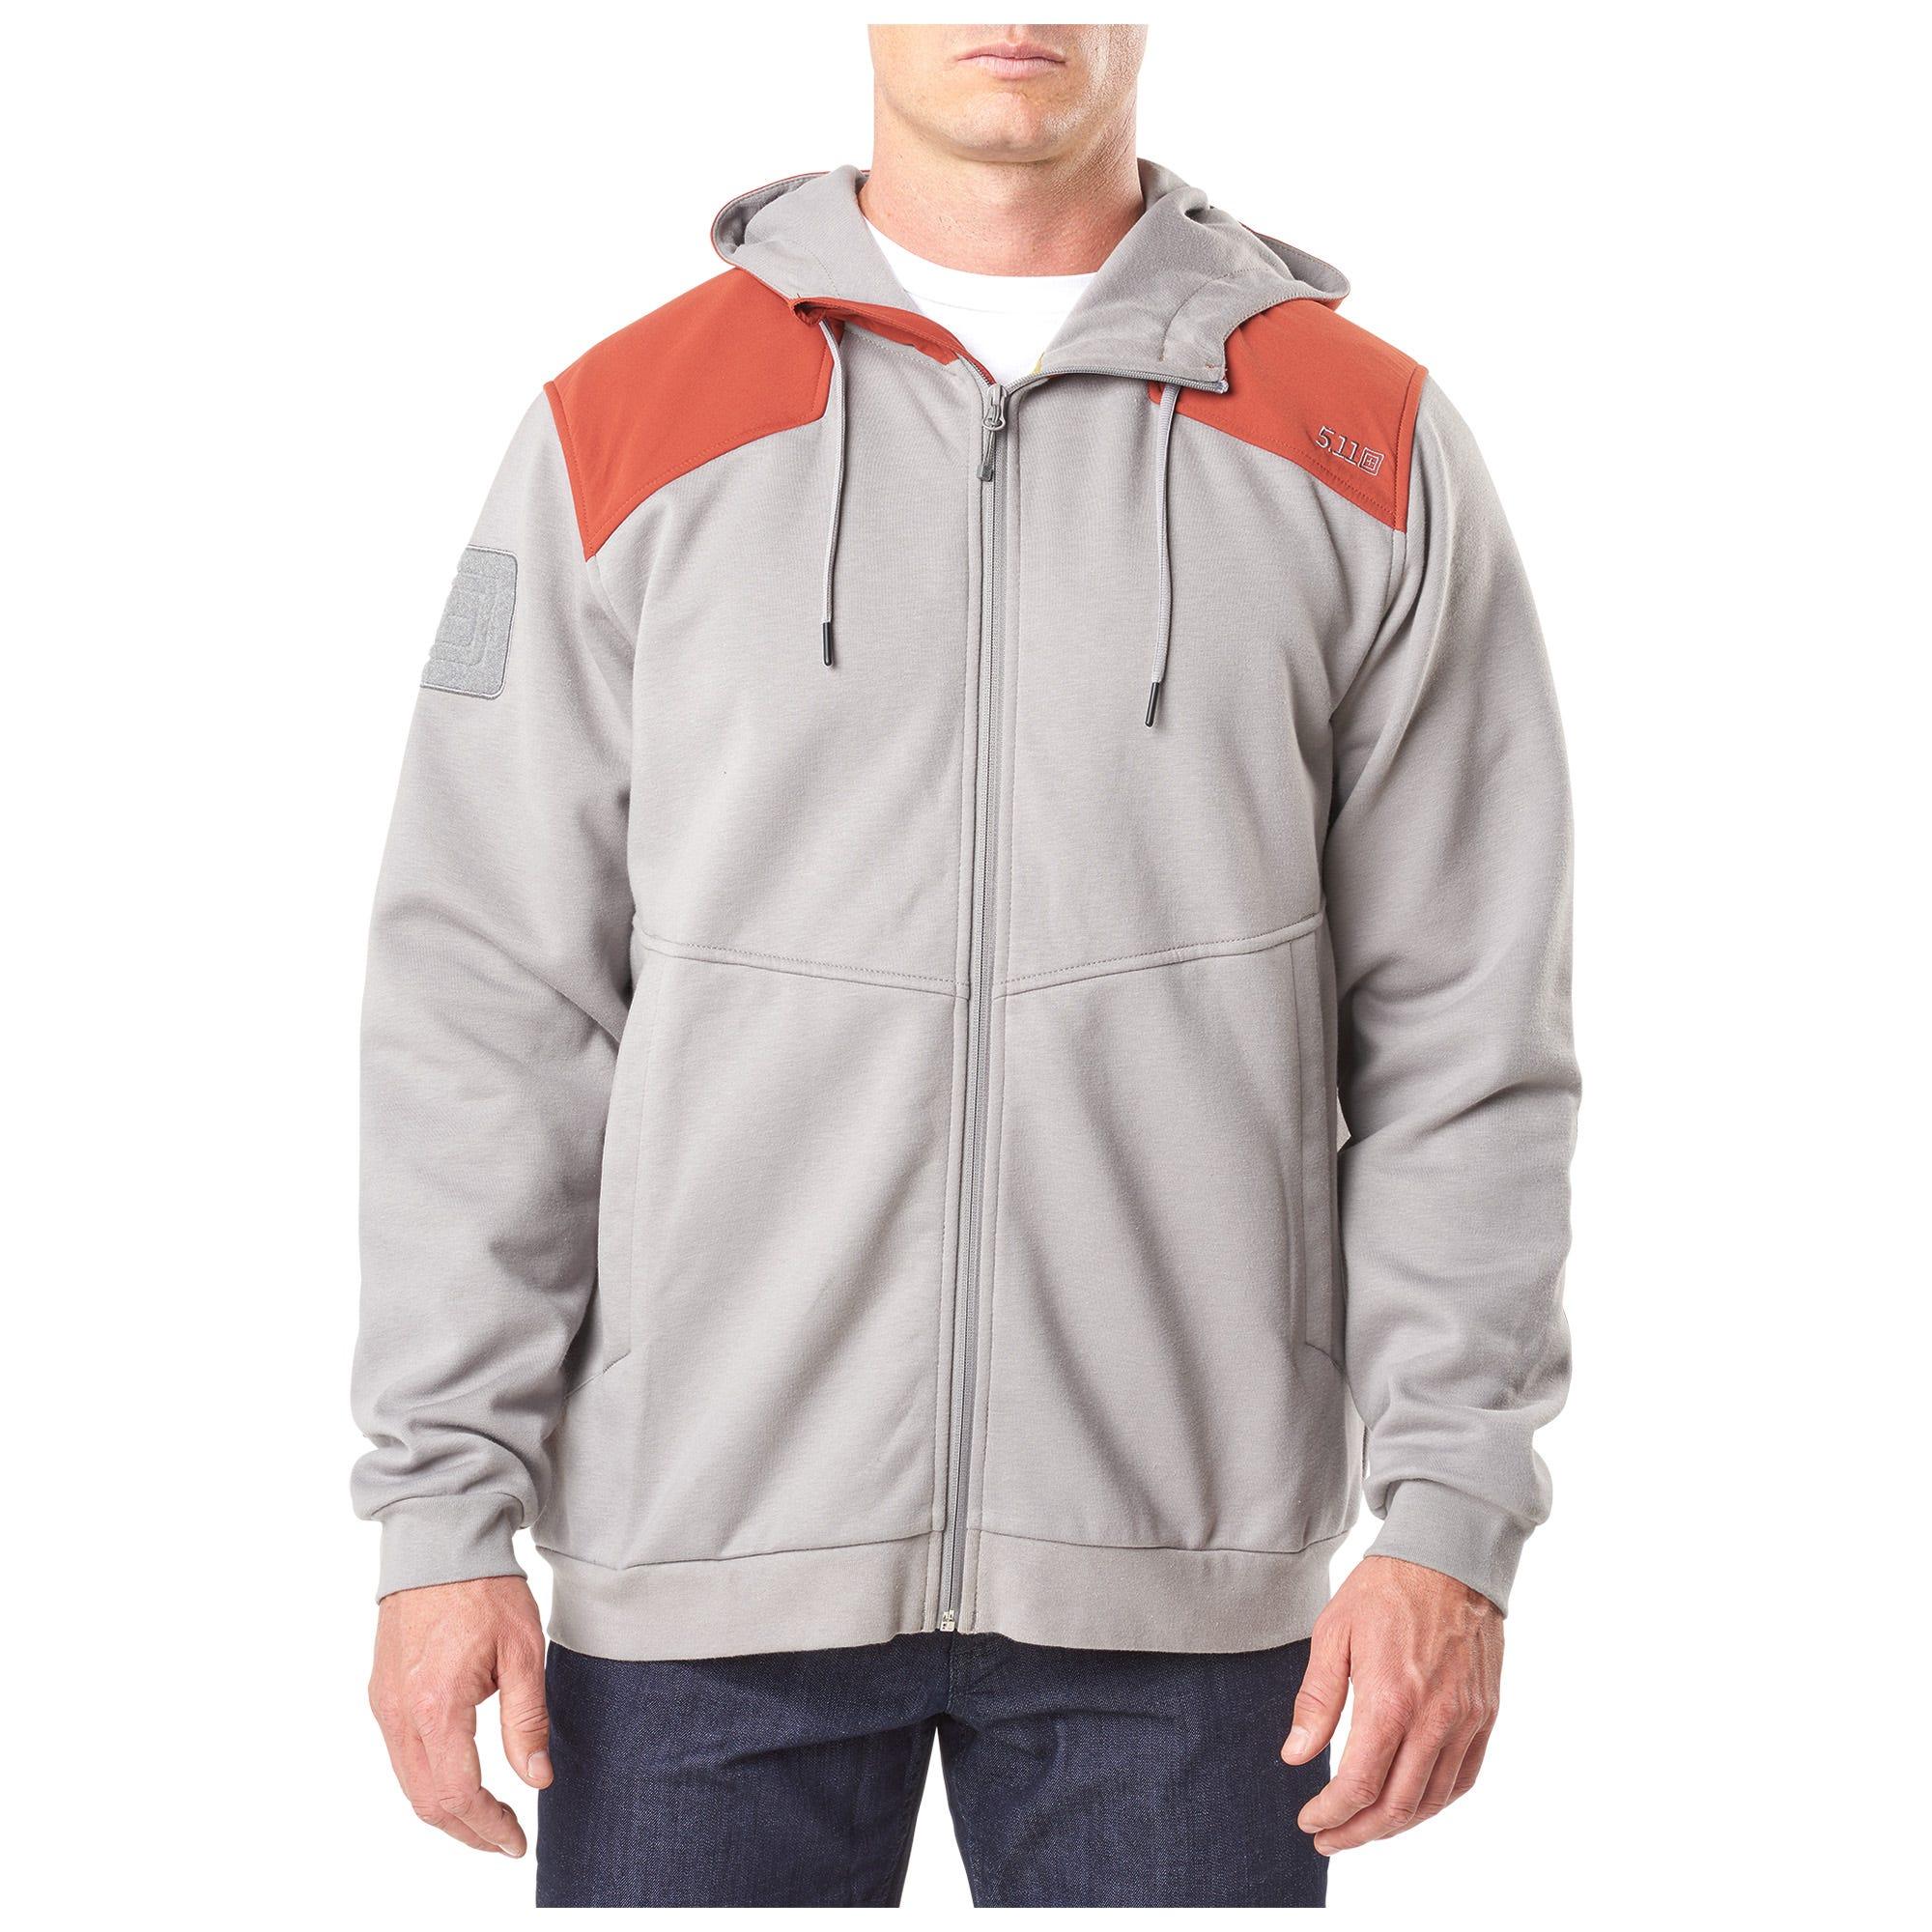 5.11 Tactical Men Armory Jacket (Grey) thumbnail